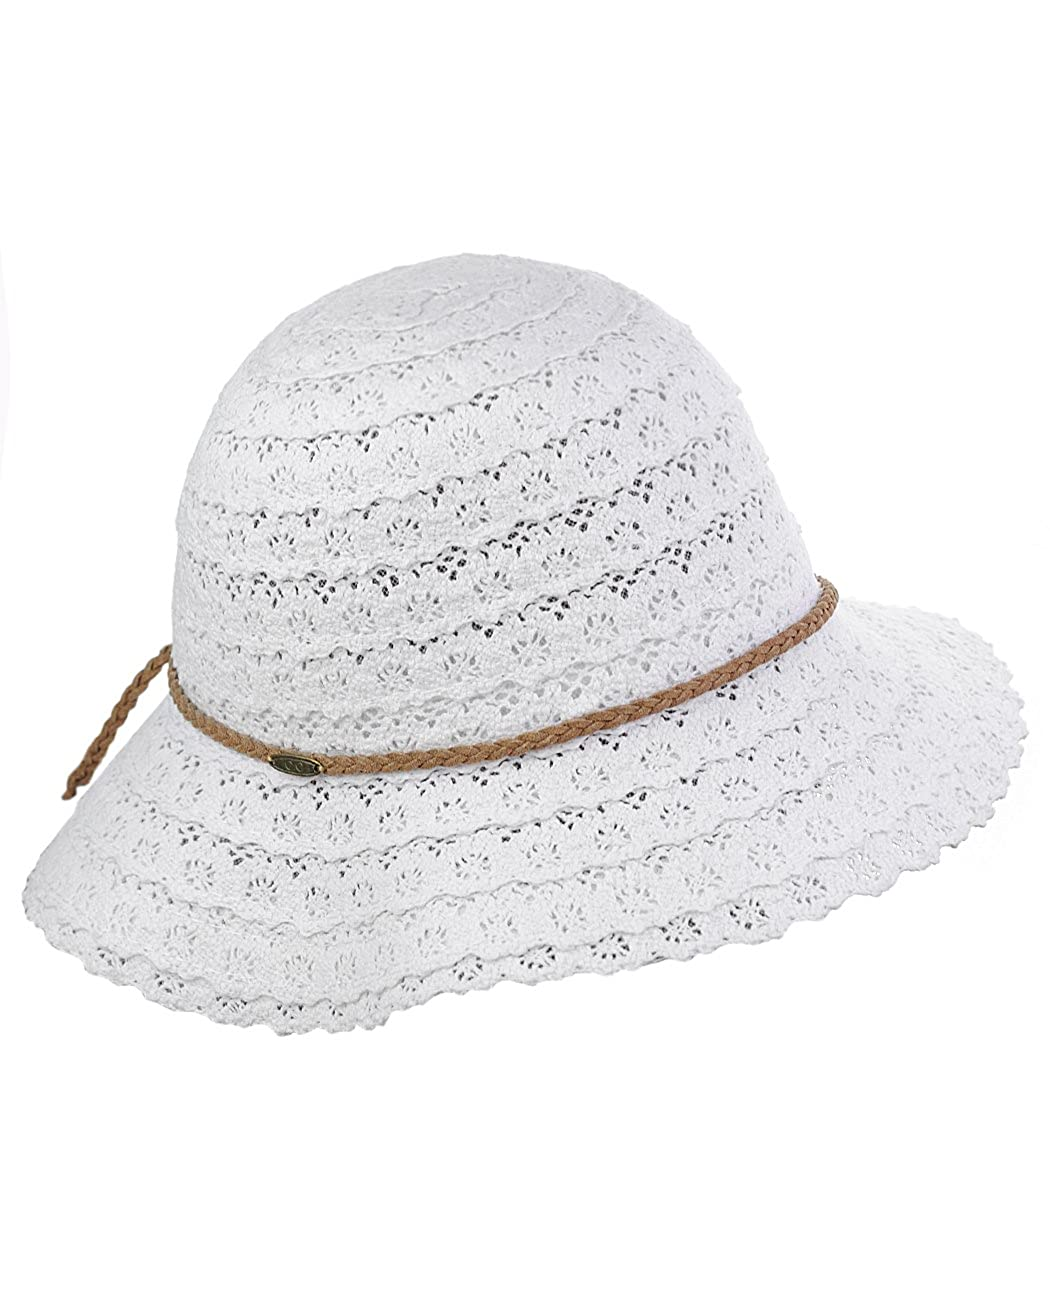 C.C Children s Brown Braided Trim Vented Beach Crushable Sun Hat ... bb6758b1c37